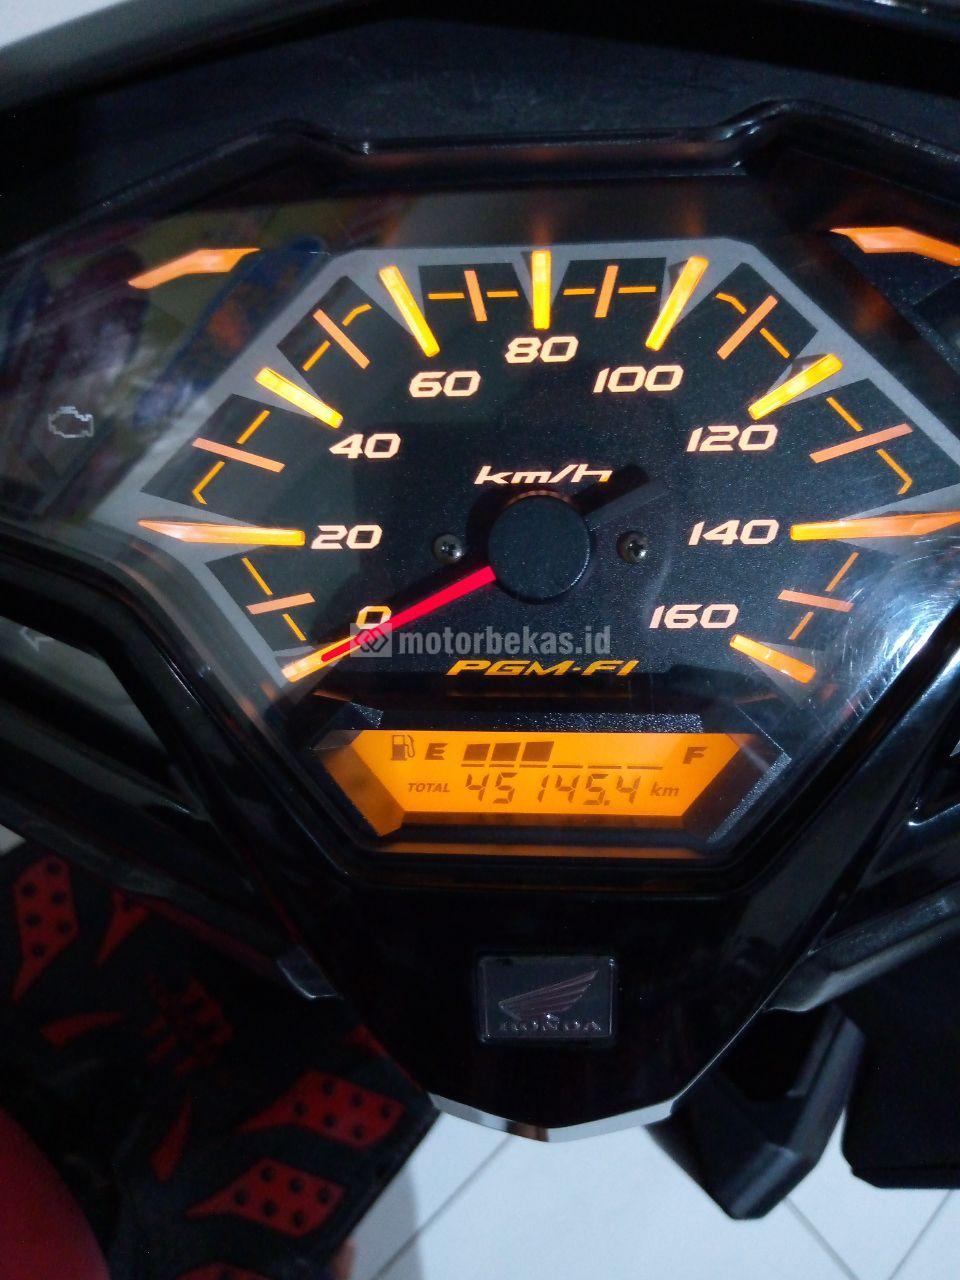 HONDA VARIO TECHNO 125  3470 motorbekas.id